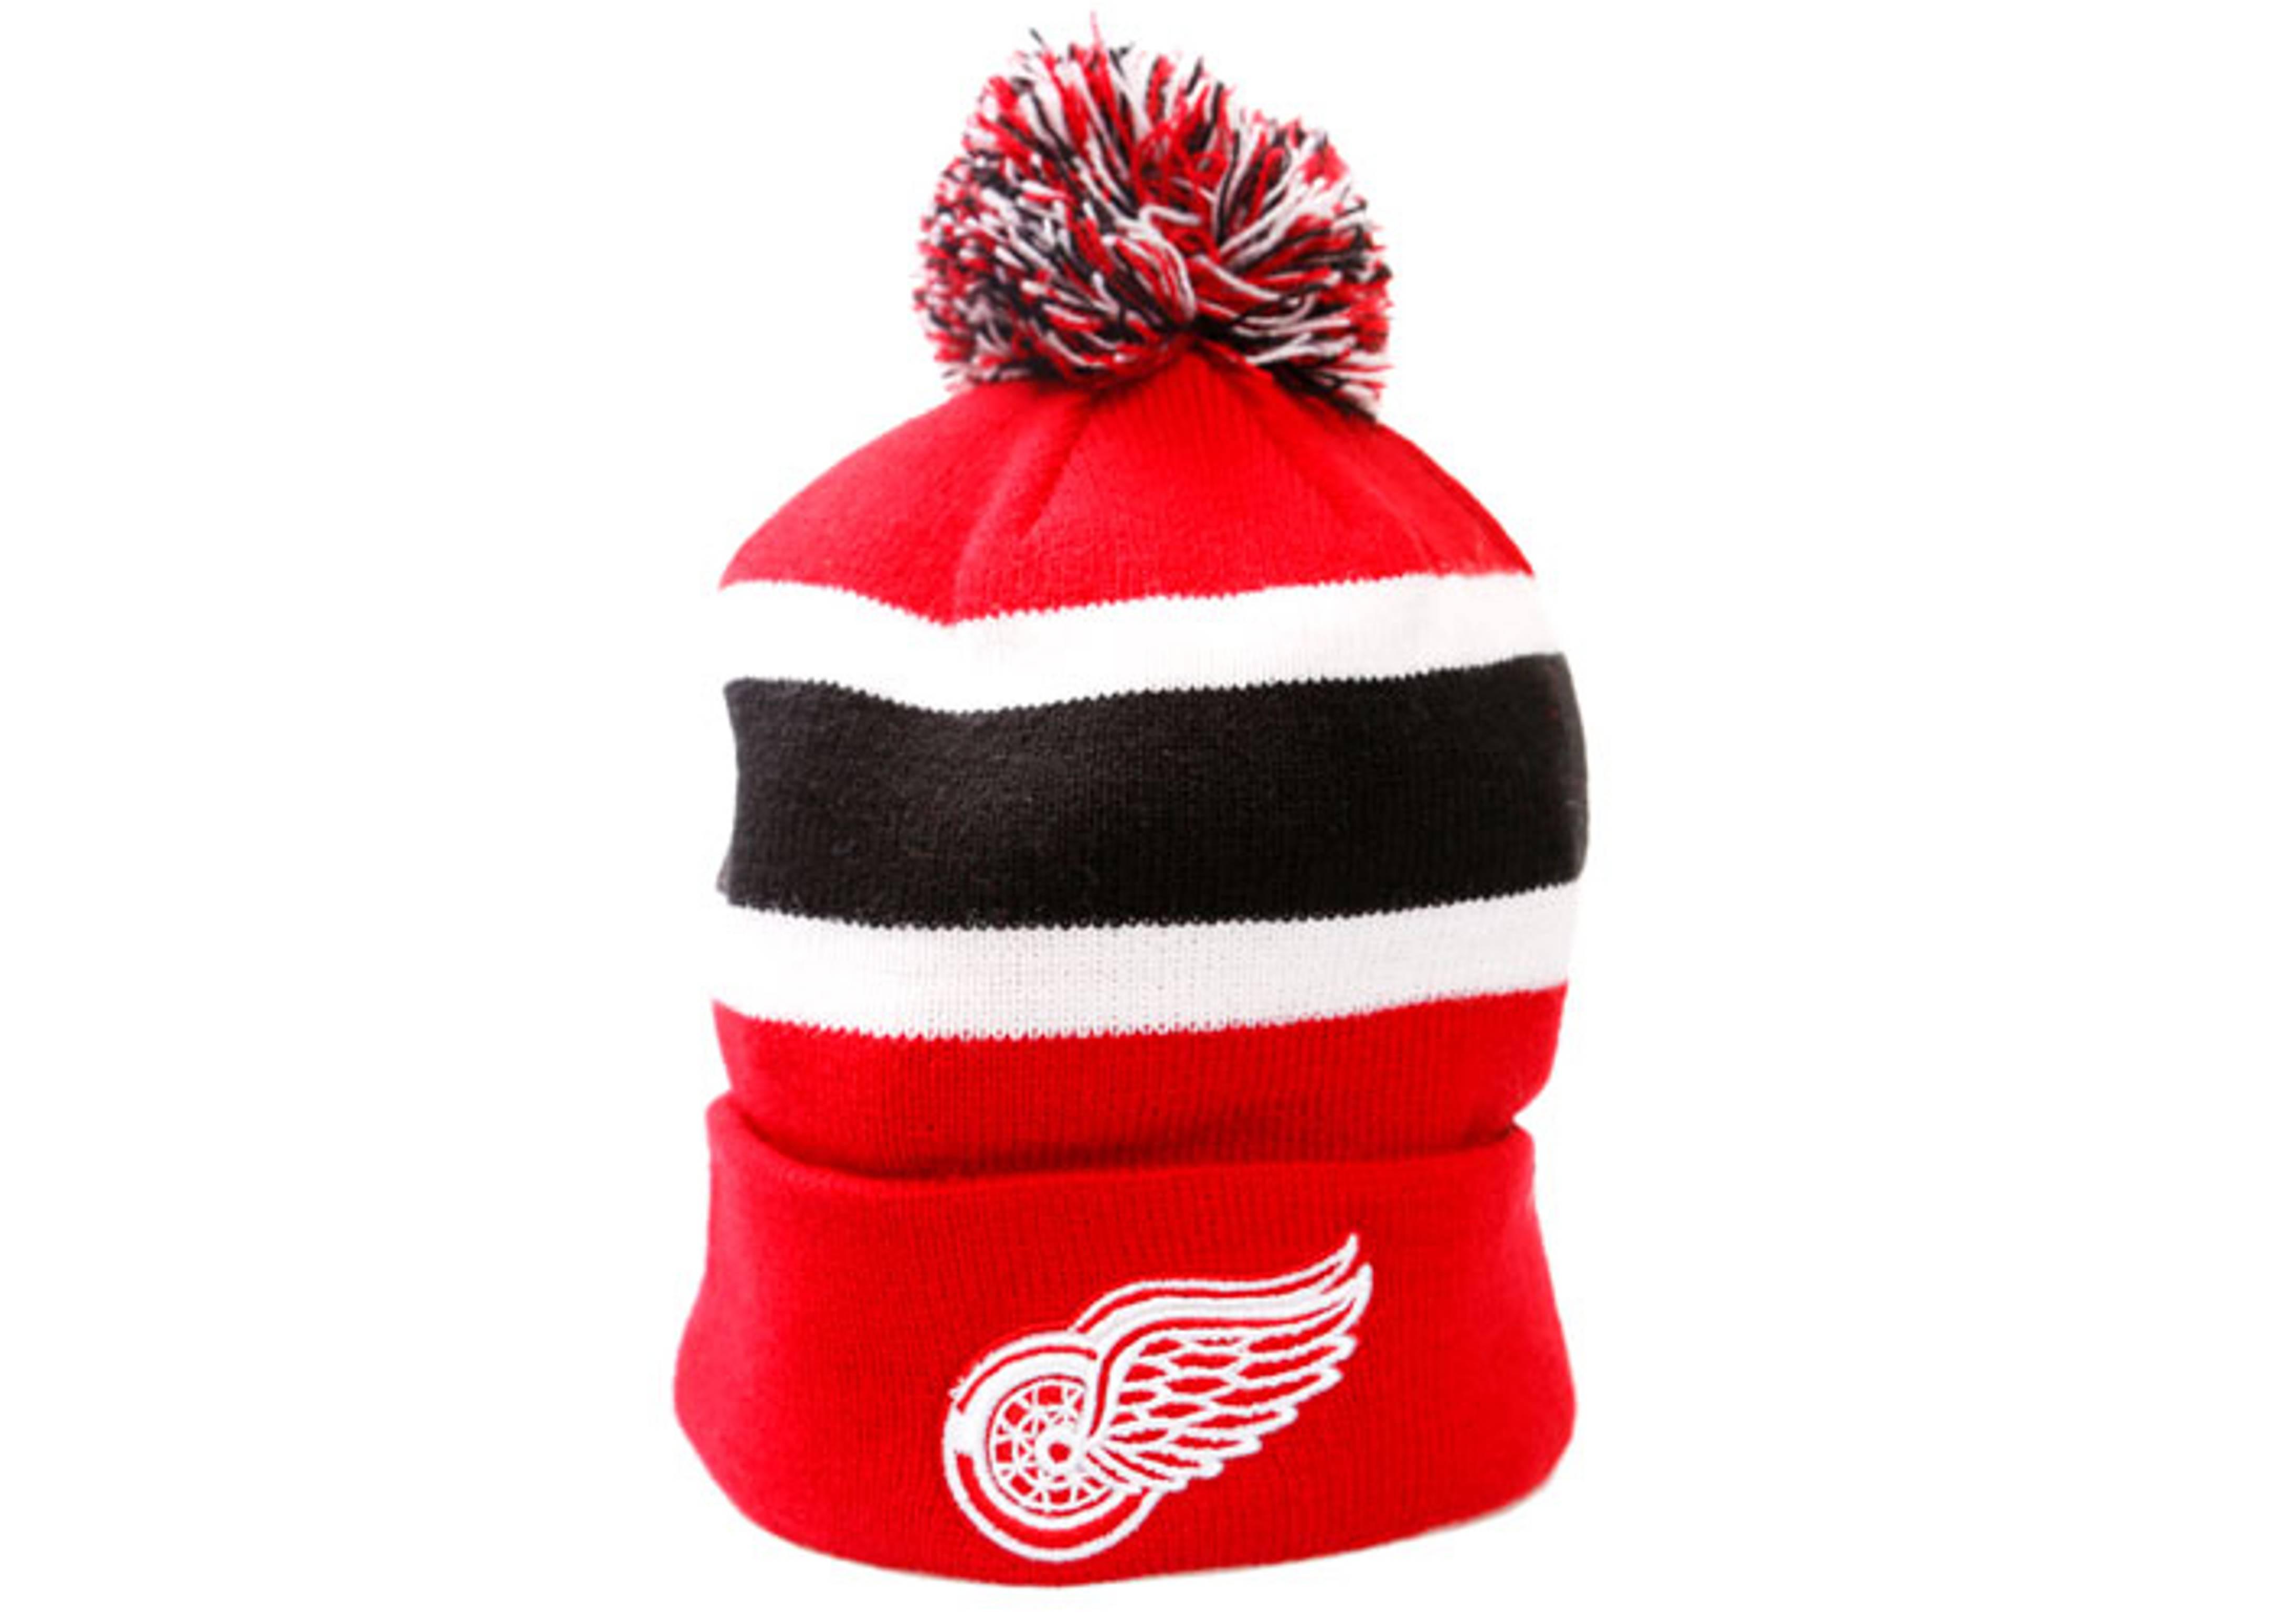 f1f9b7195bbf11 Detroit Red Wings Cuffed Pom Knit Beanie - 47 Brand - hbrkaw05acerd ...